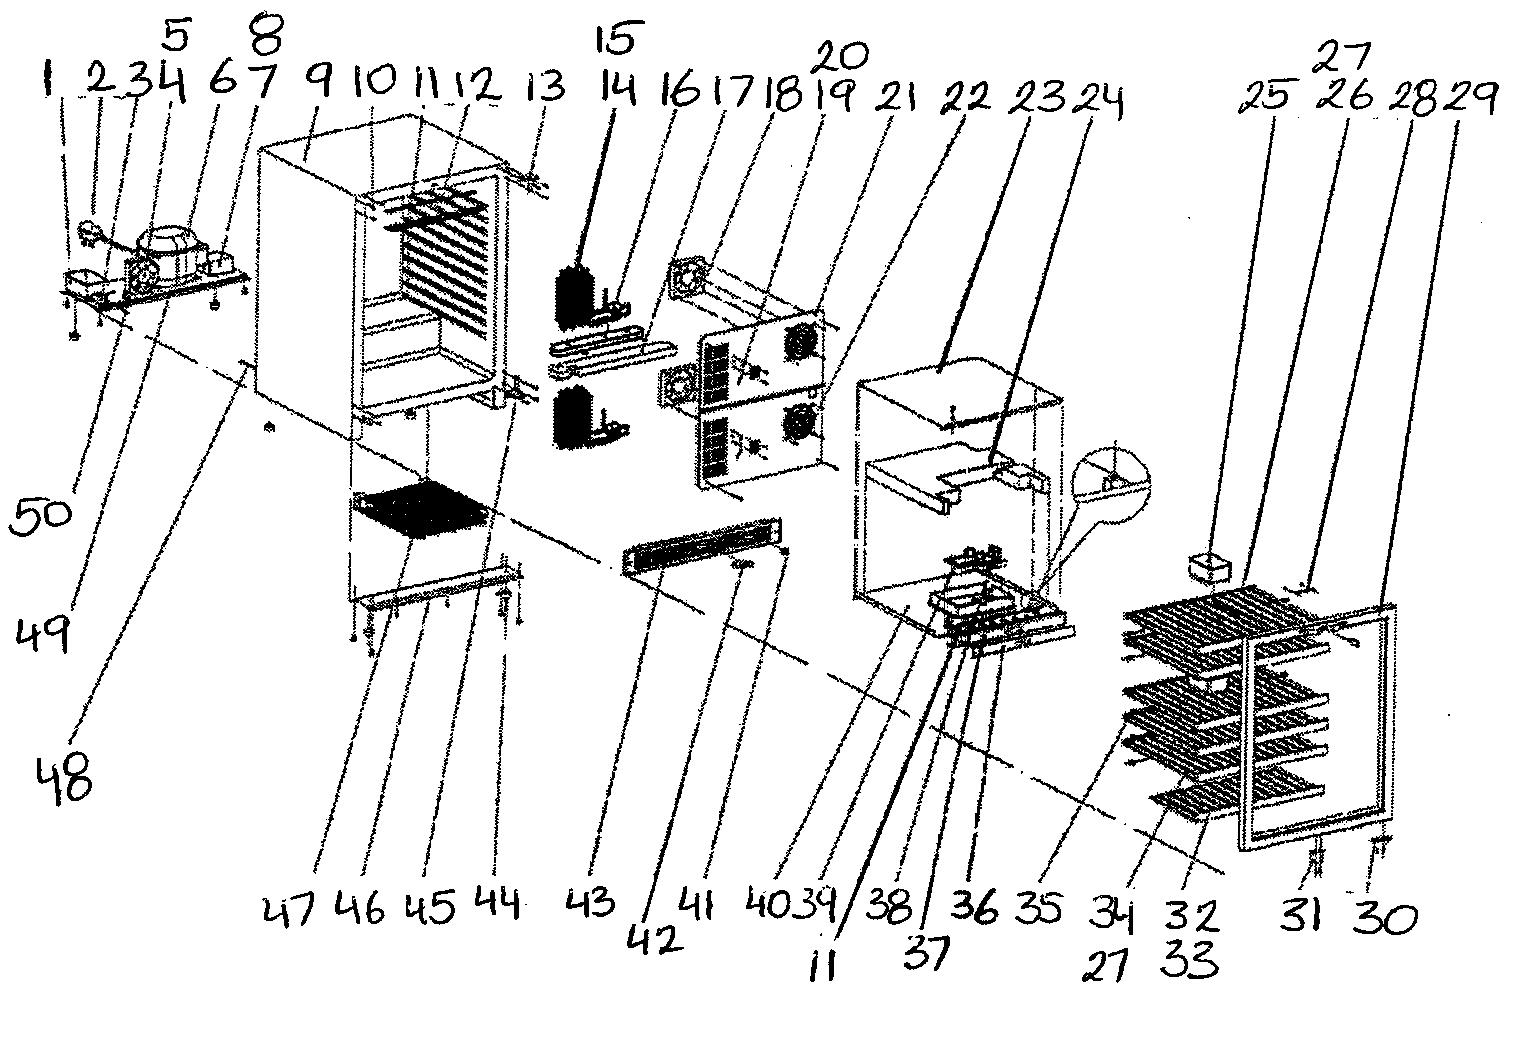 Danby wiring diagram tractor parts service and repair manuals rh ru s wiring diagram for danby